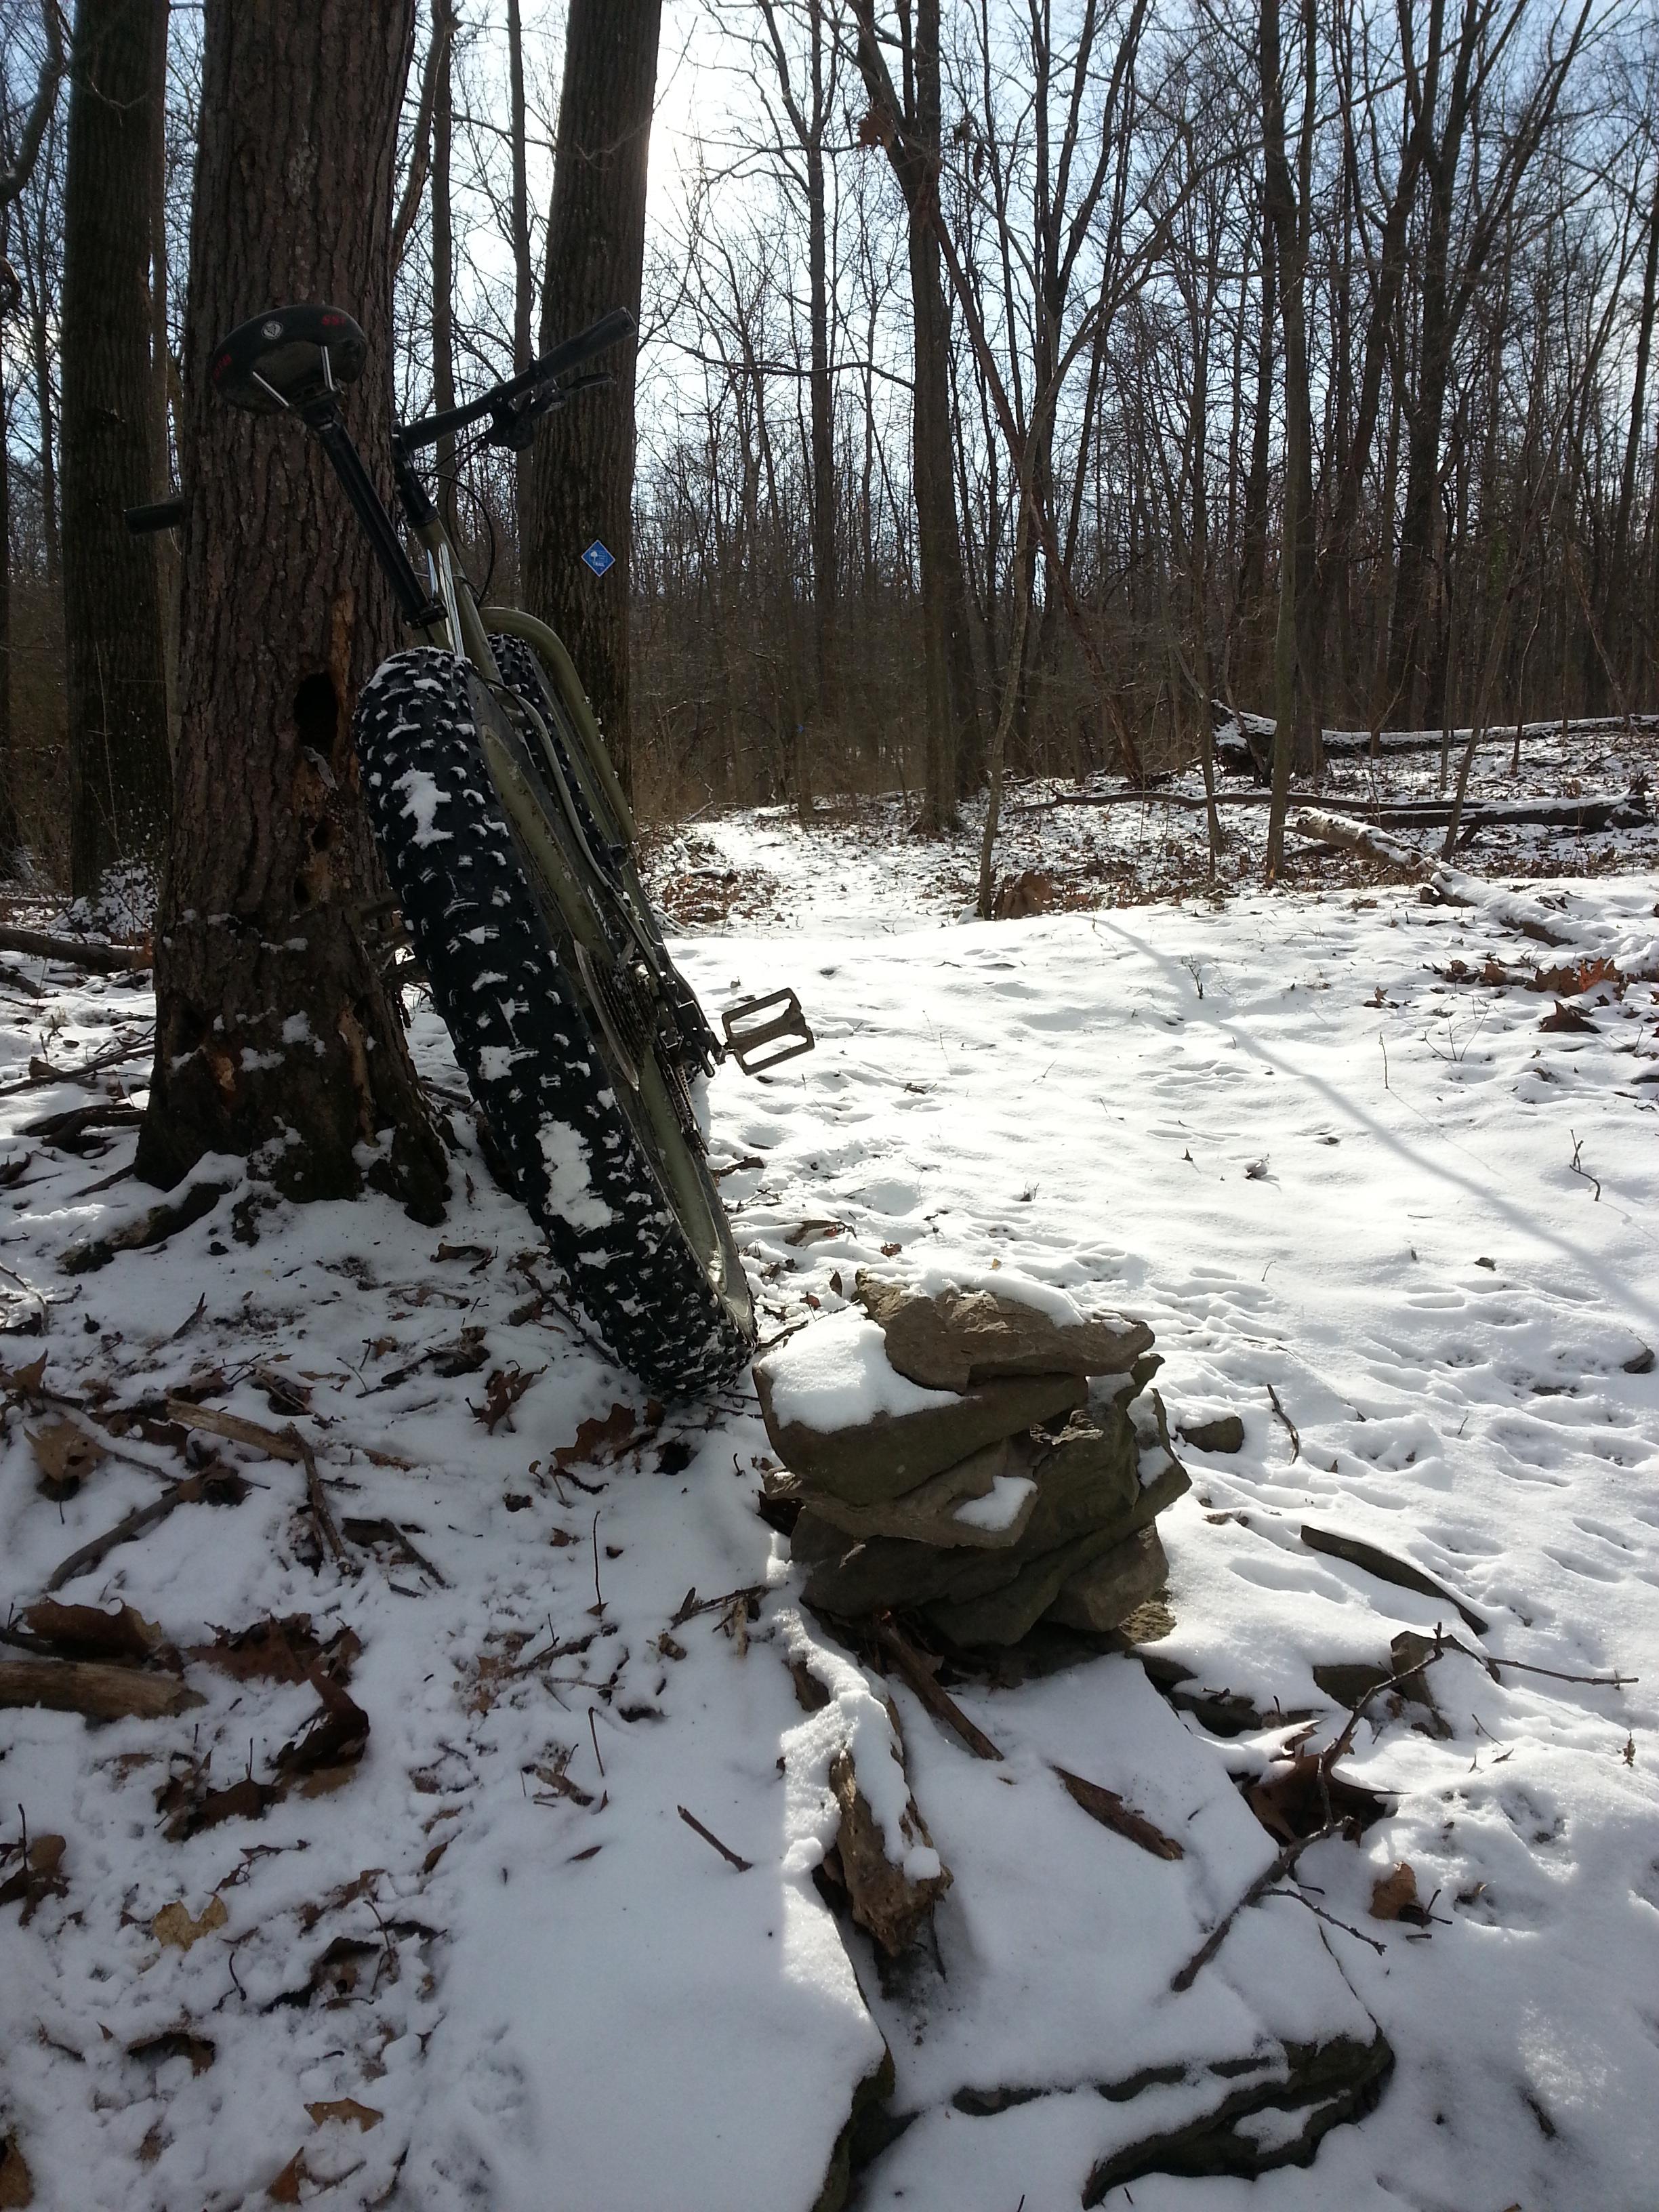 East_Trail_Snow_Fatbike.jpg